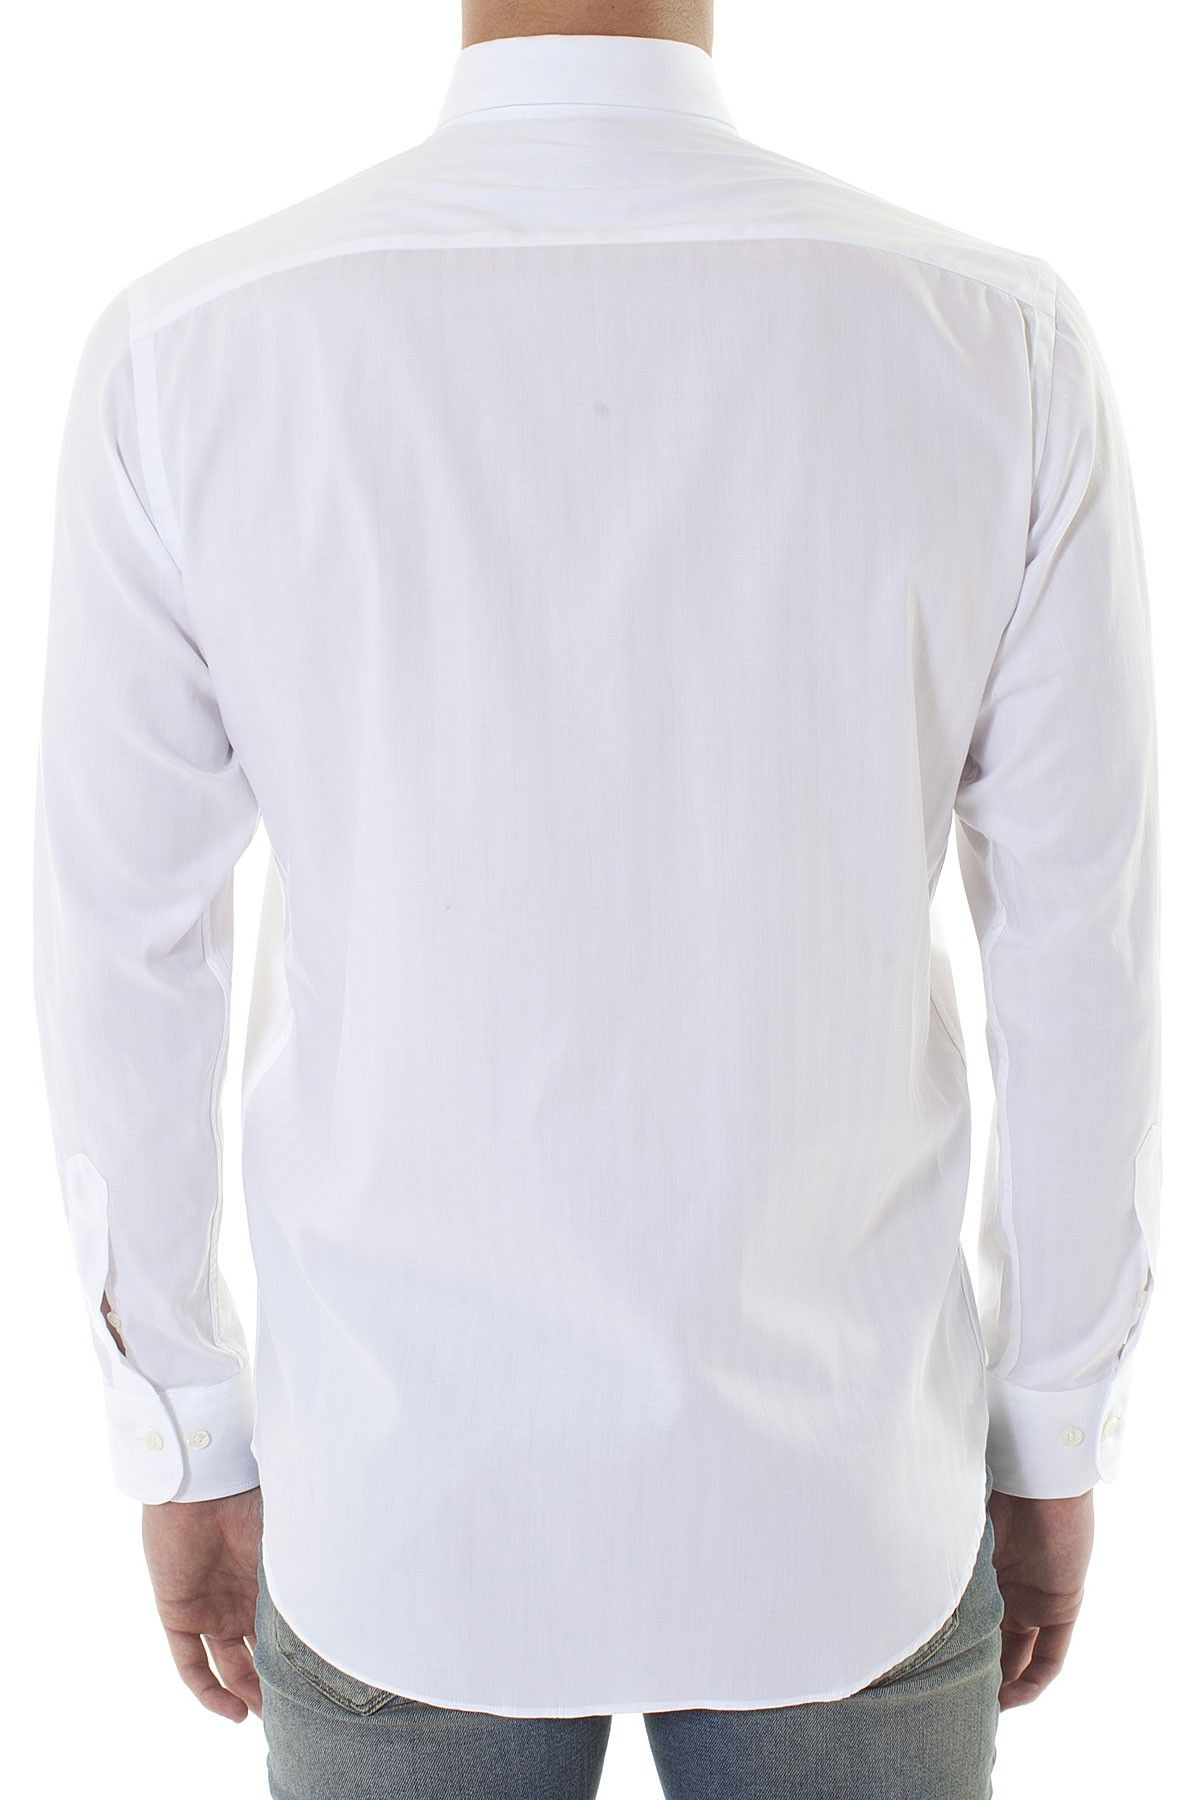 size 40 02778 b3b04 ETRO Camicia bianca per uomo - Rione Fontana